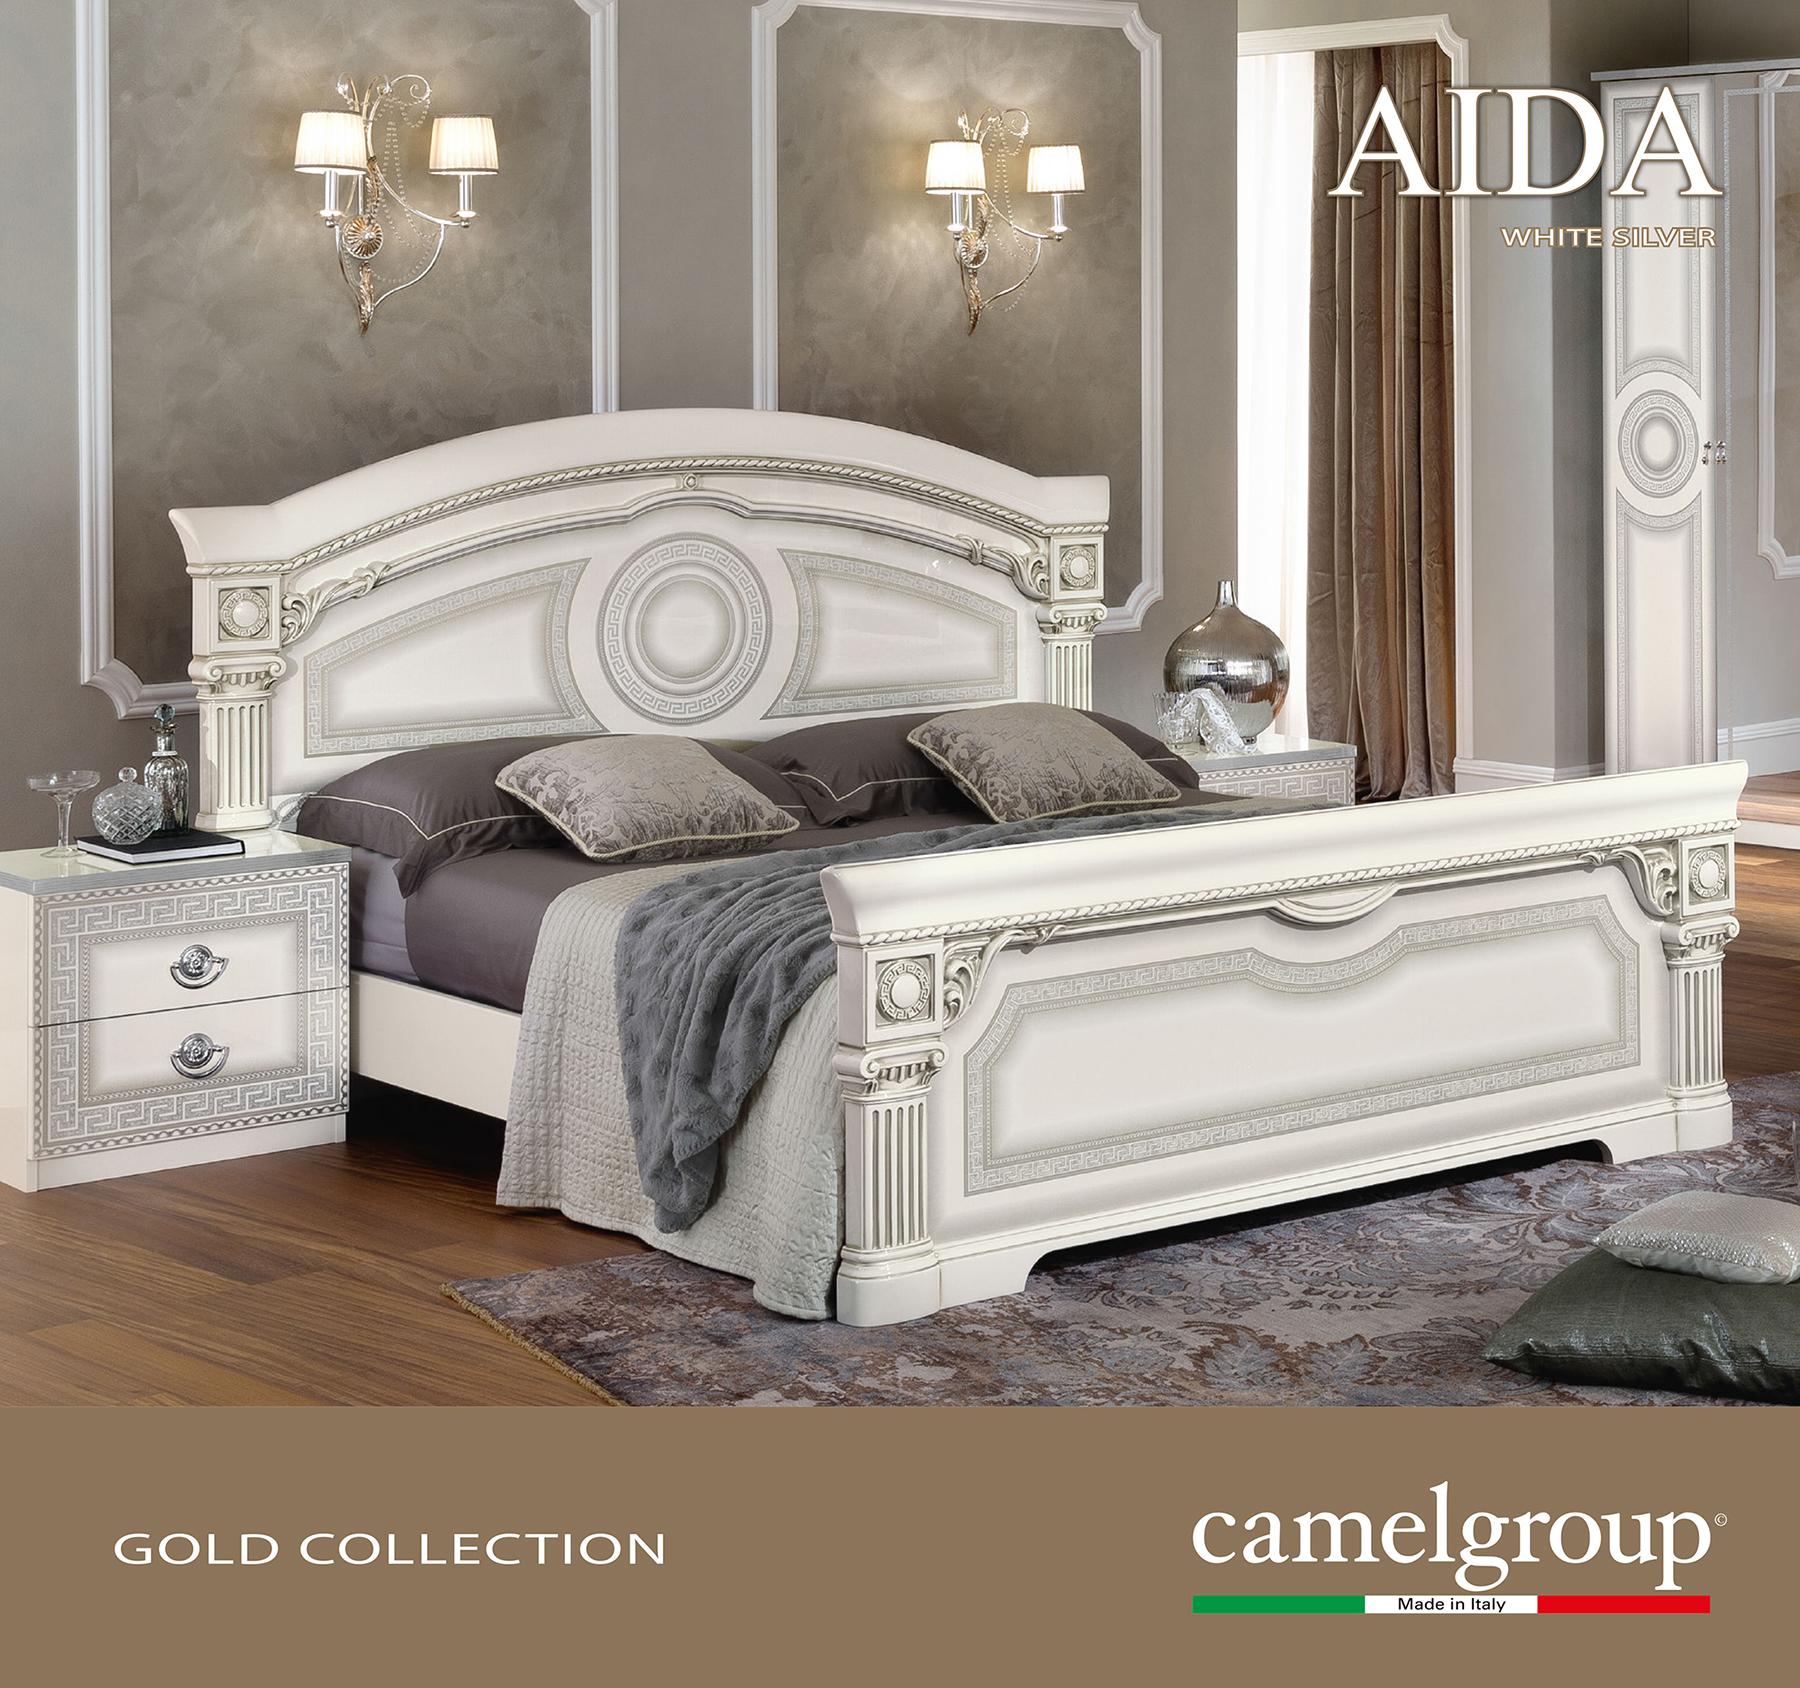 Aida White W/Silver Bed